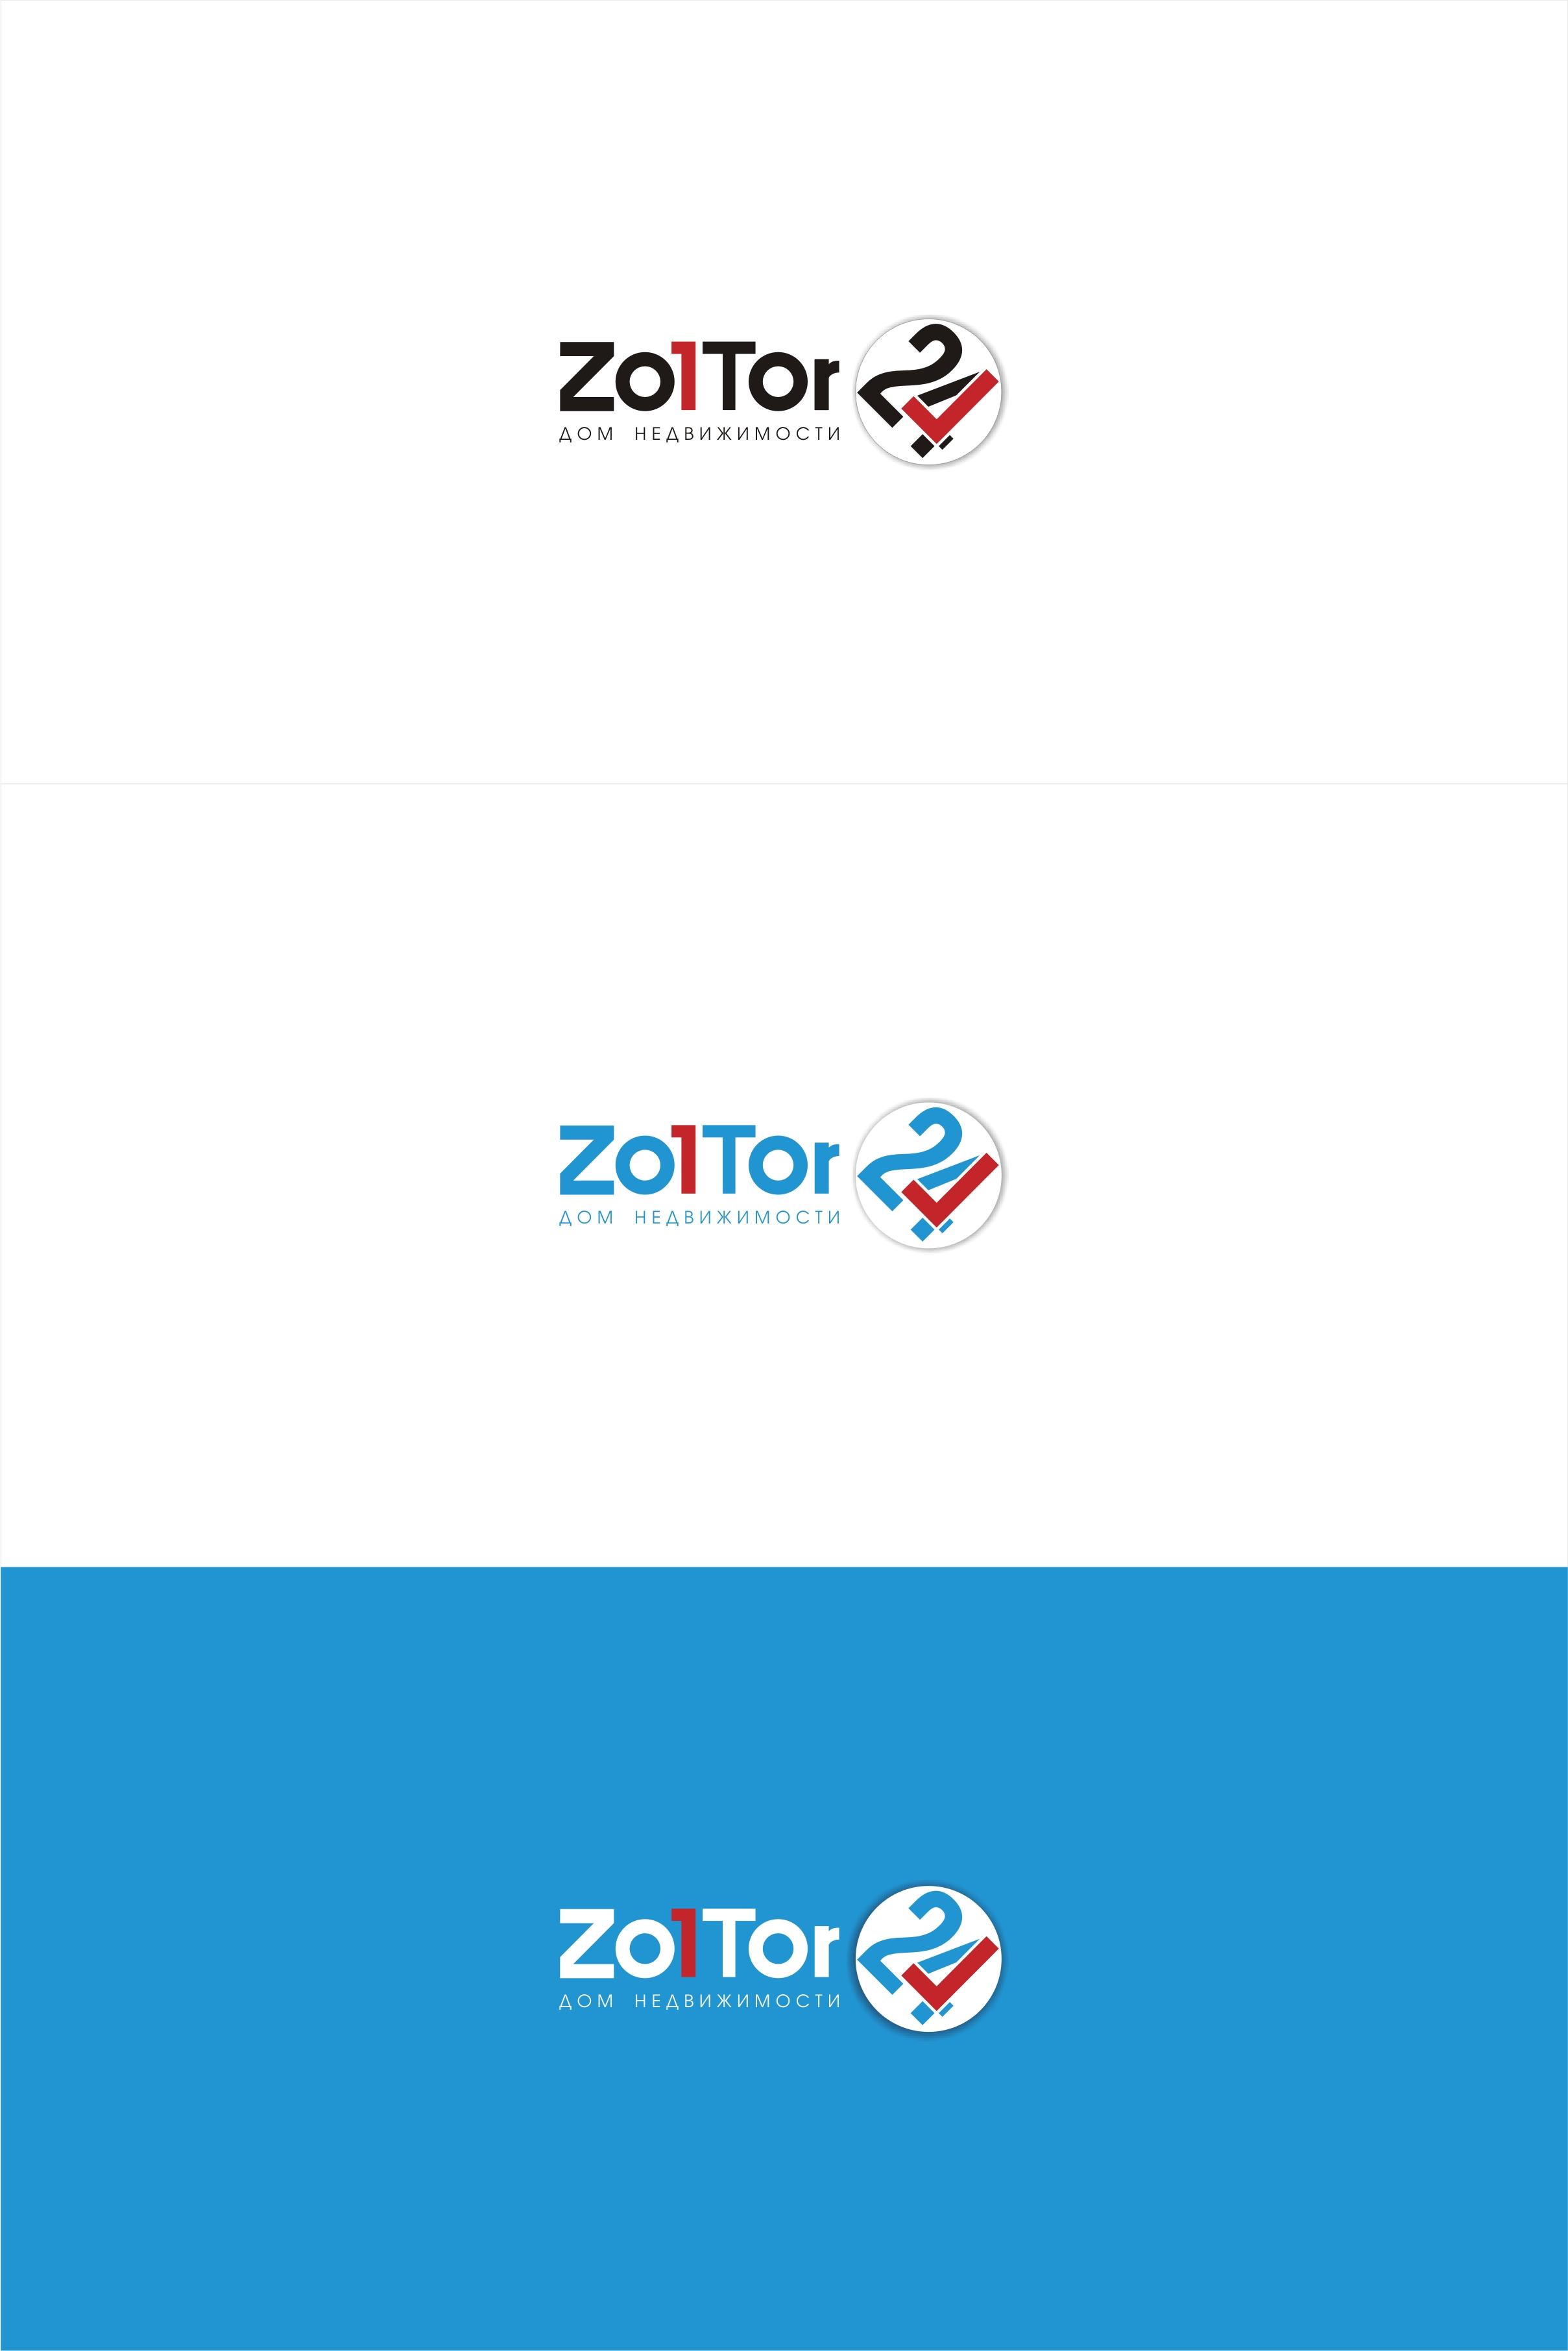 Логотип и фирменный стиль ZolTor24 фото f_5215c90d2e345322.jpg